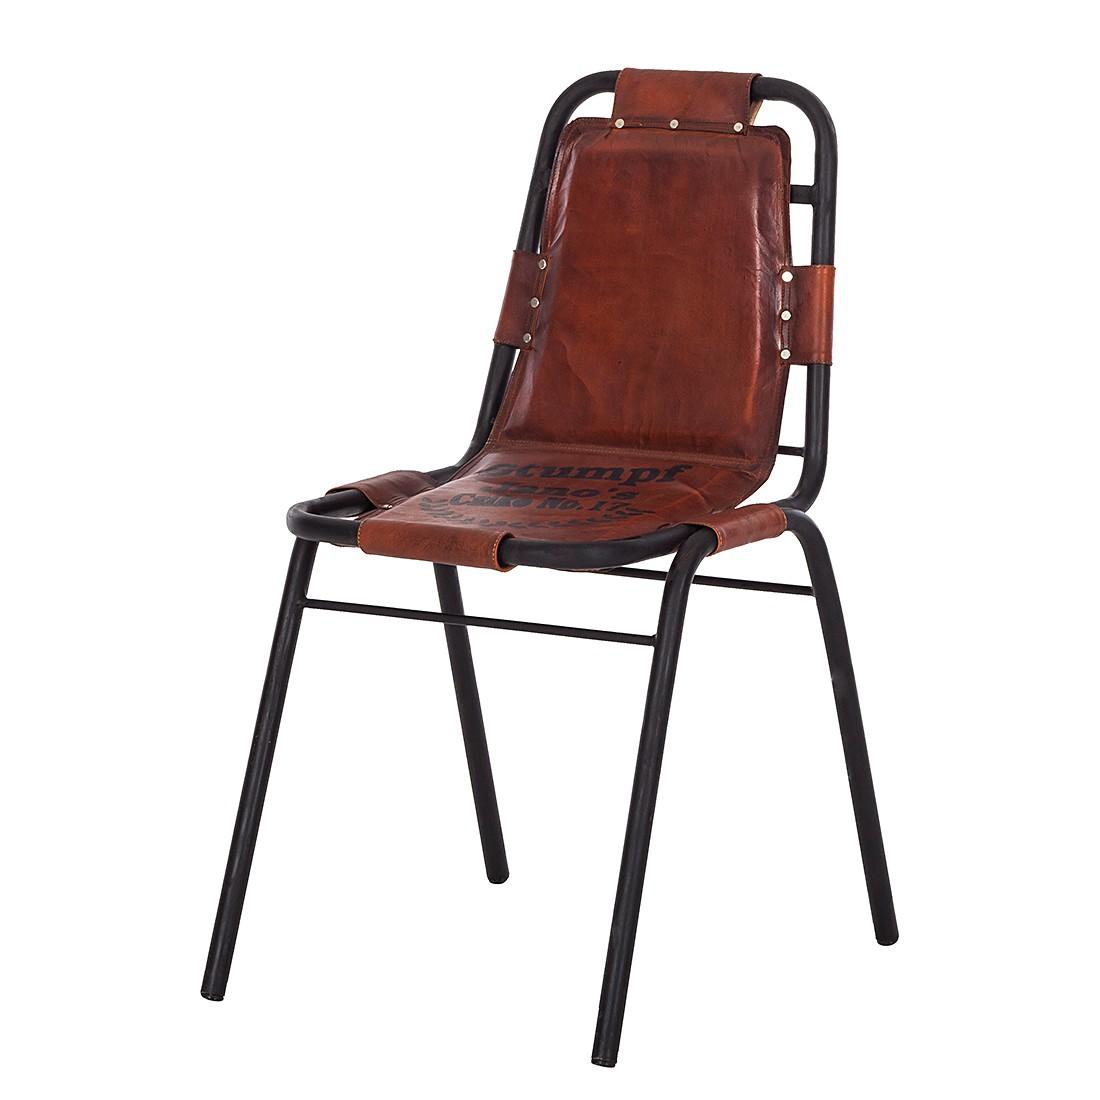 furnlab Stuhl Havanna - Eisen/Echtleder - Braun, furnlab